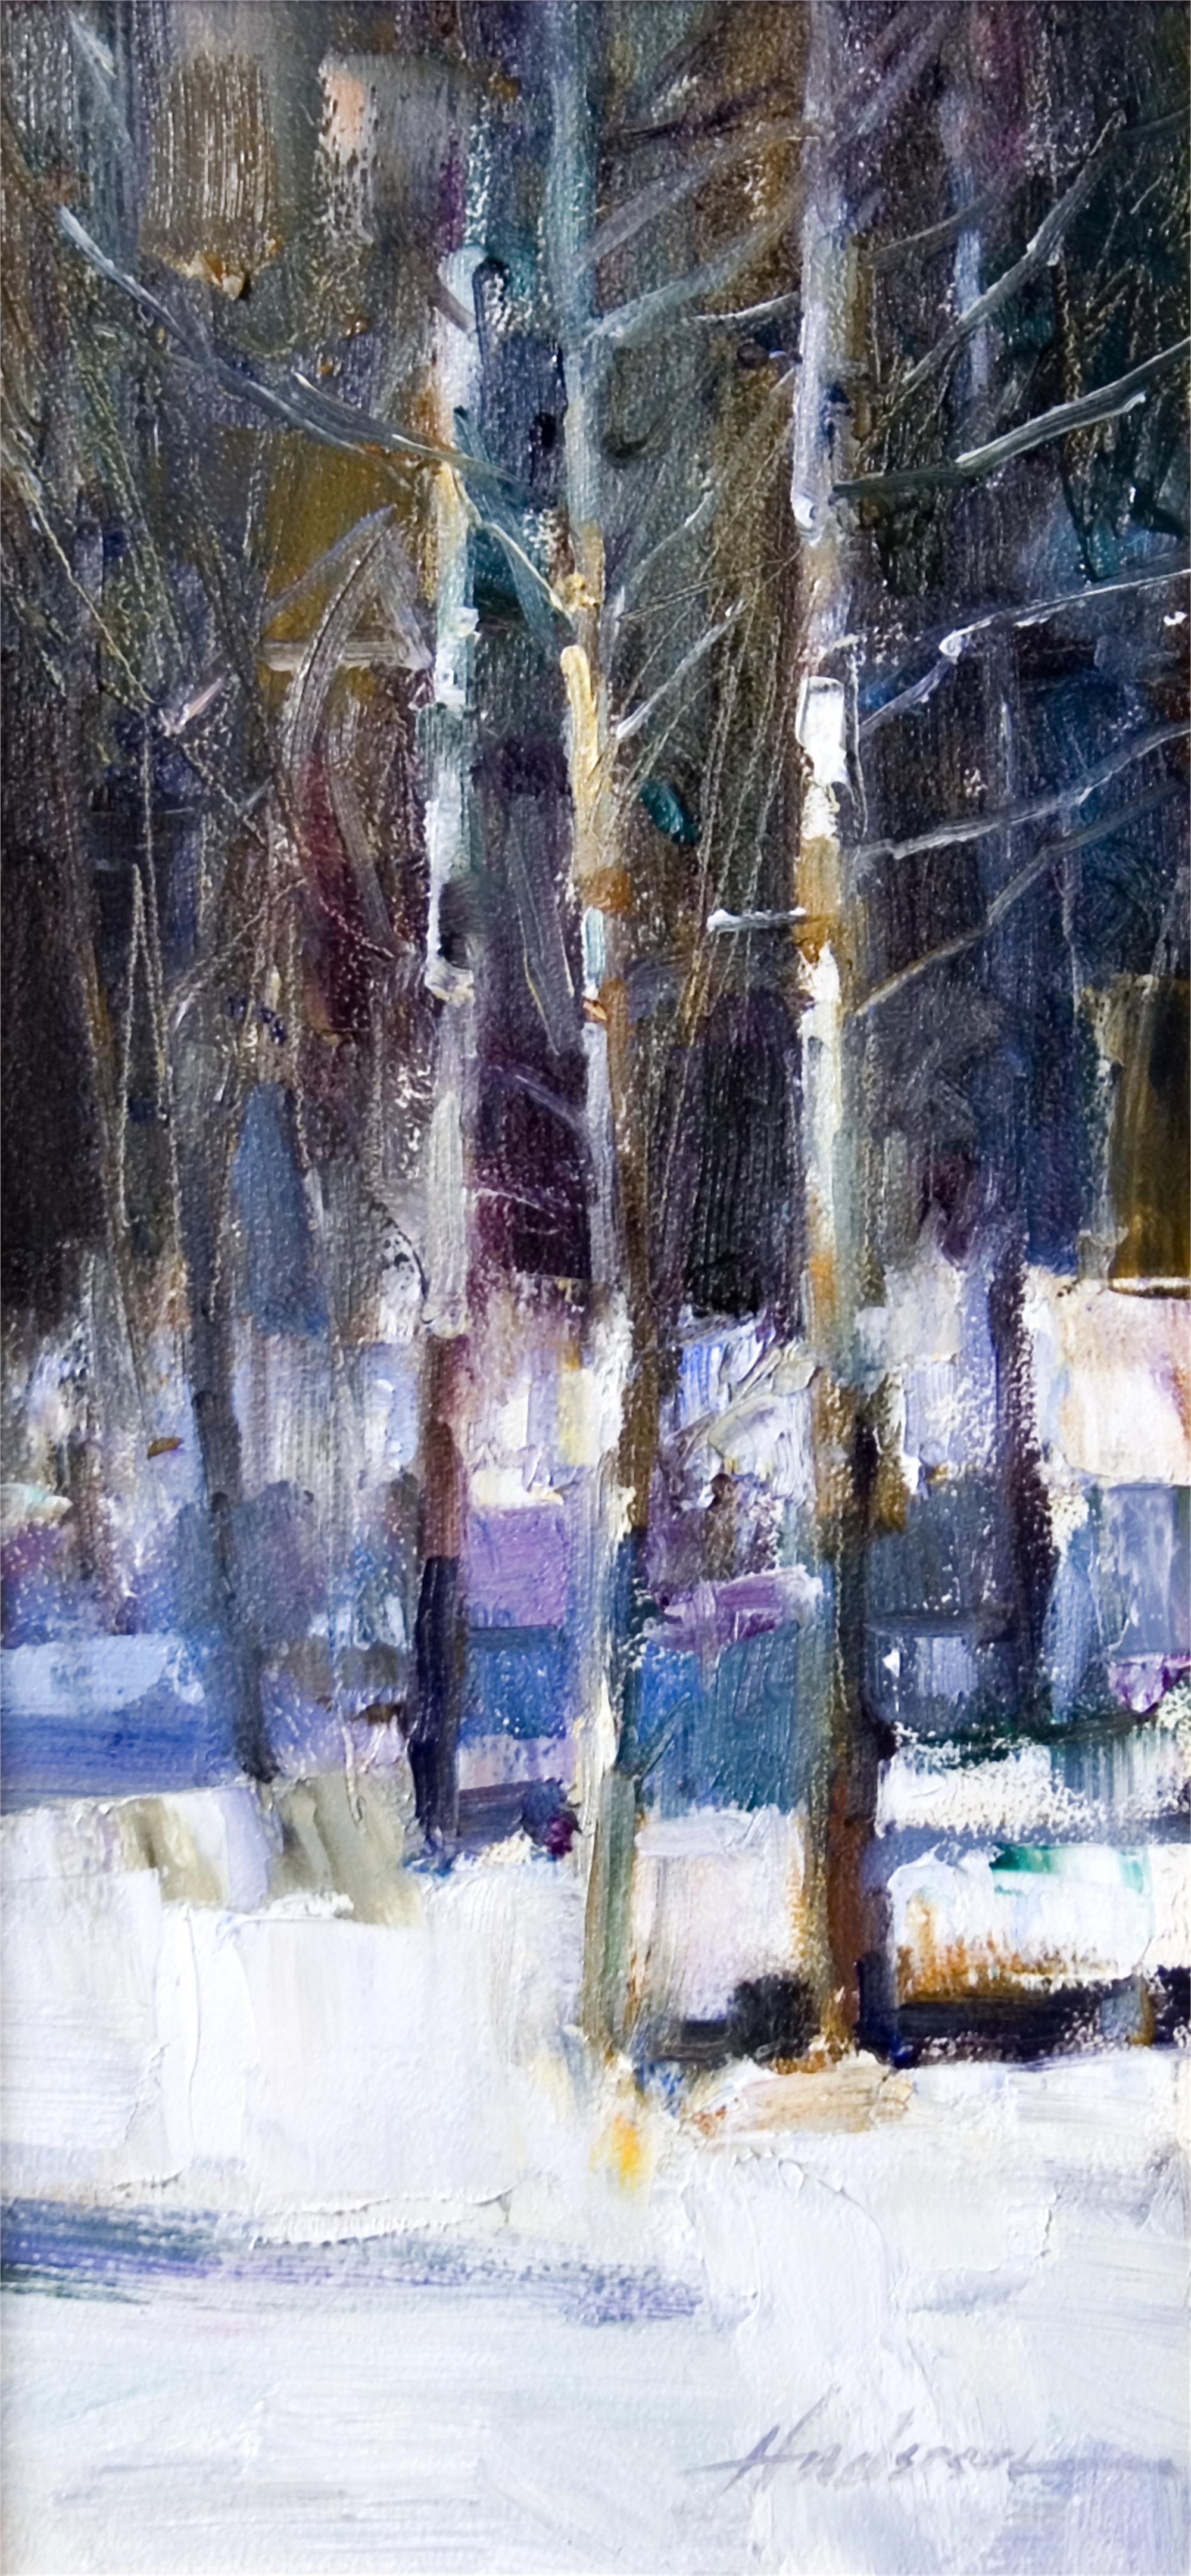 Fractal Trees II by Carolyn Anderson